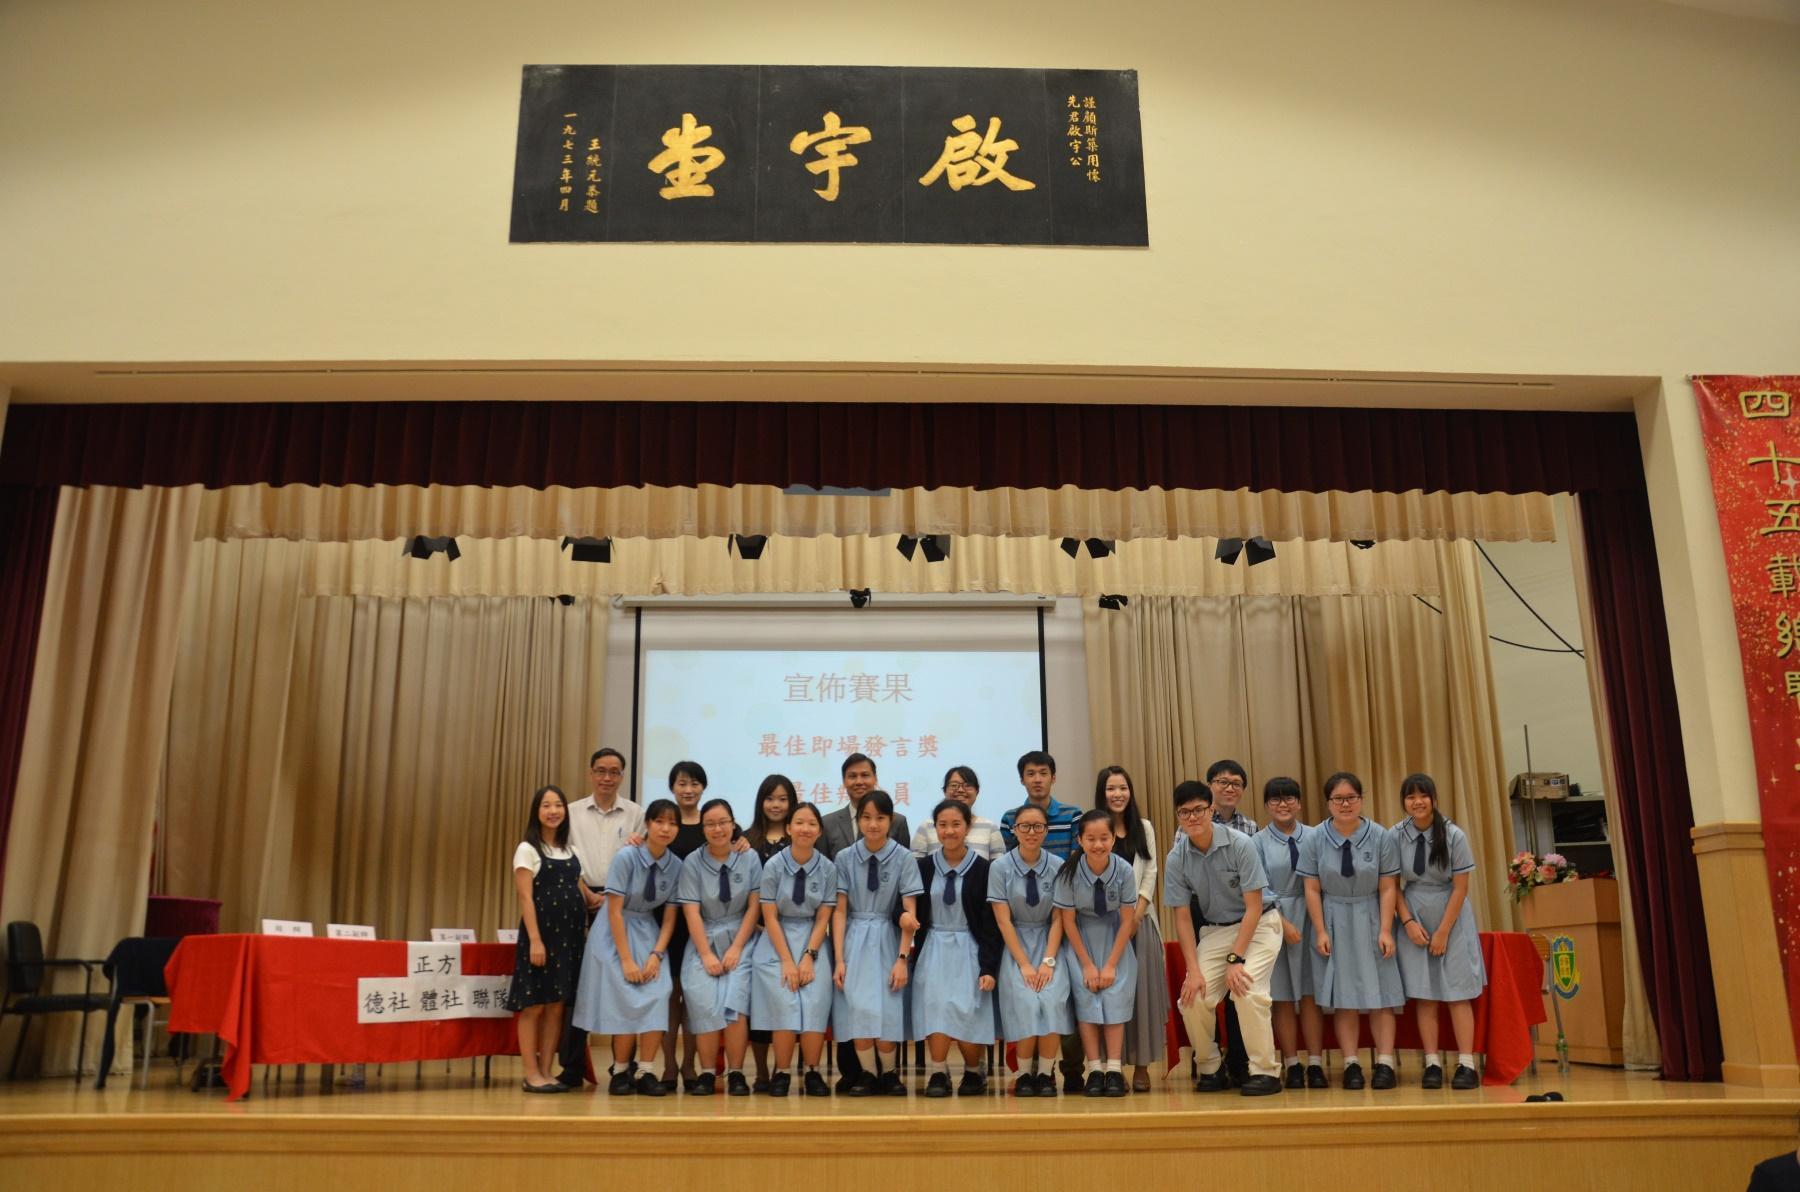 http://www.npc.edu.hk/sites/default/files/dsc_6819.jpg